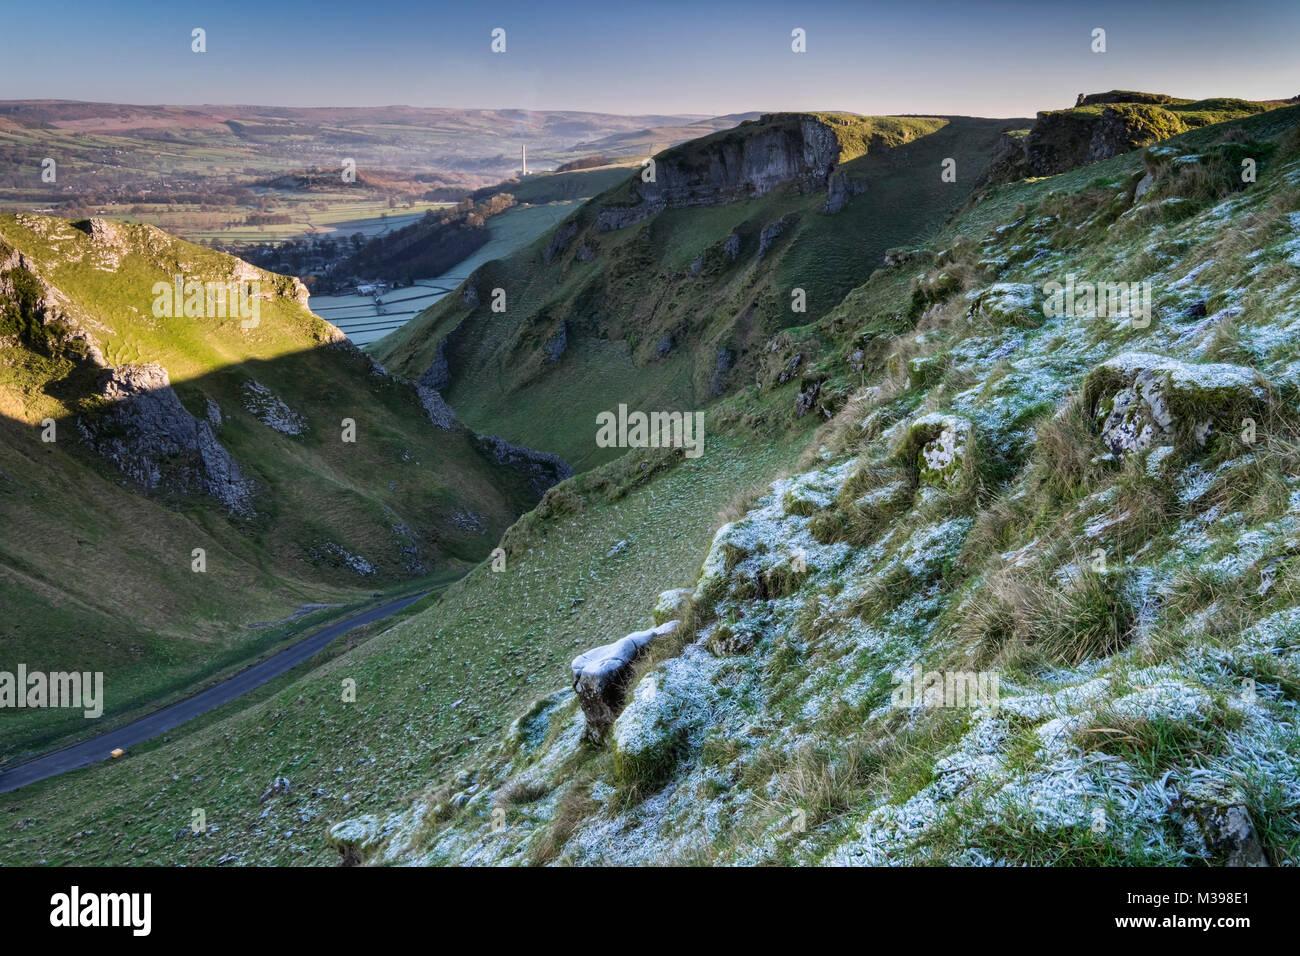 Winnats Pass limestone gorge in winter, near Castleton, Peak District National Park, Derbyshire, England, UK - Stock Image